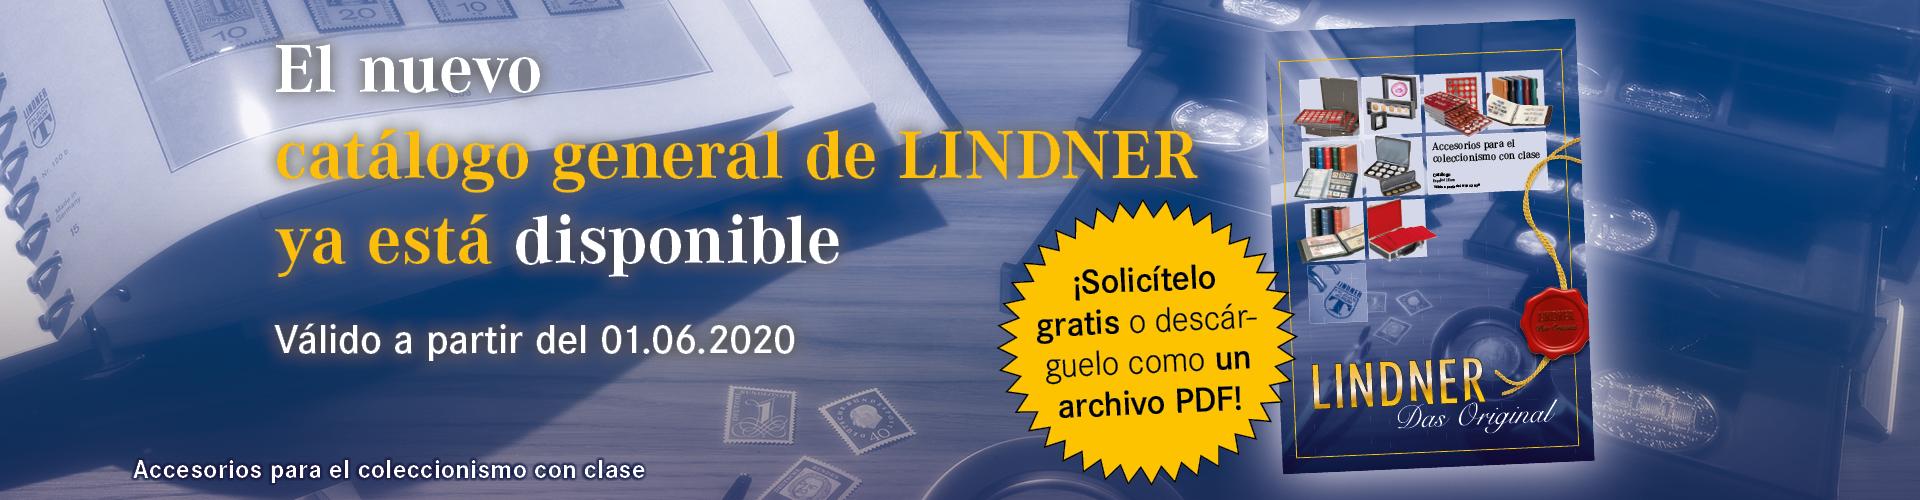 Catálogo general de LINDNER